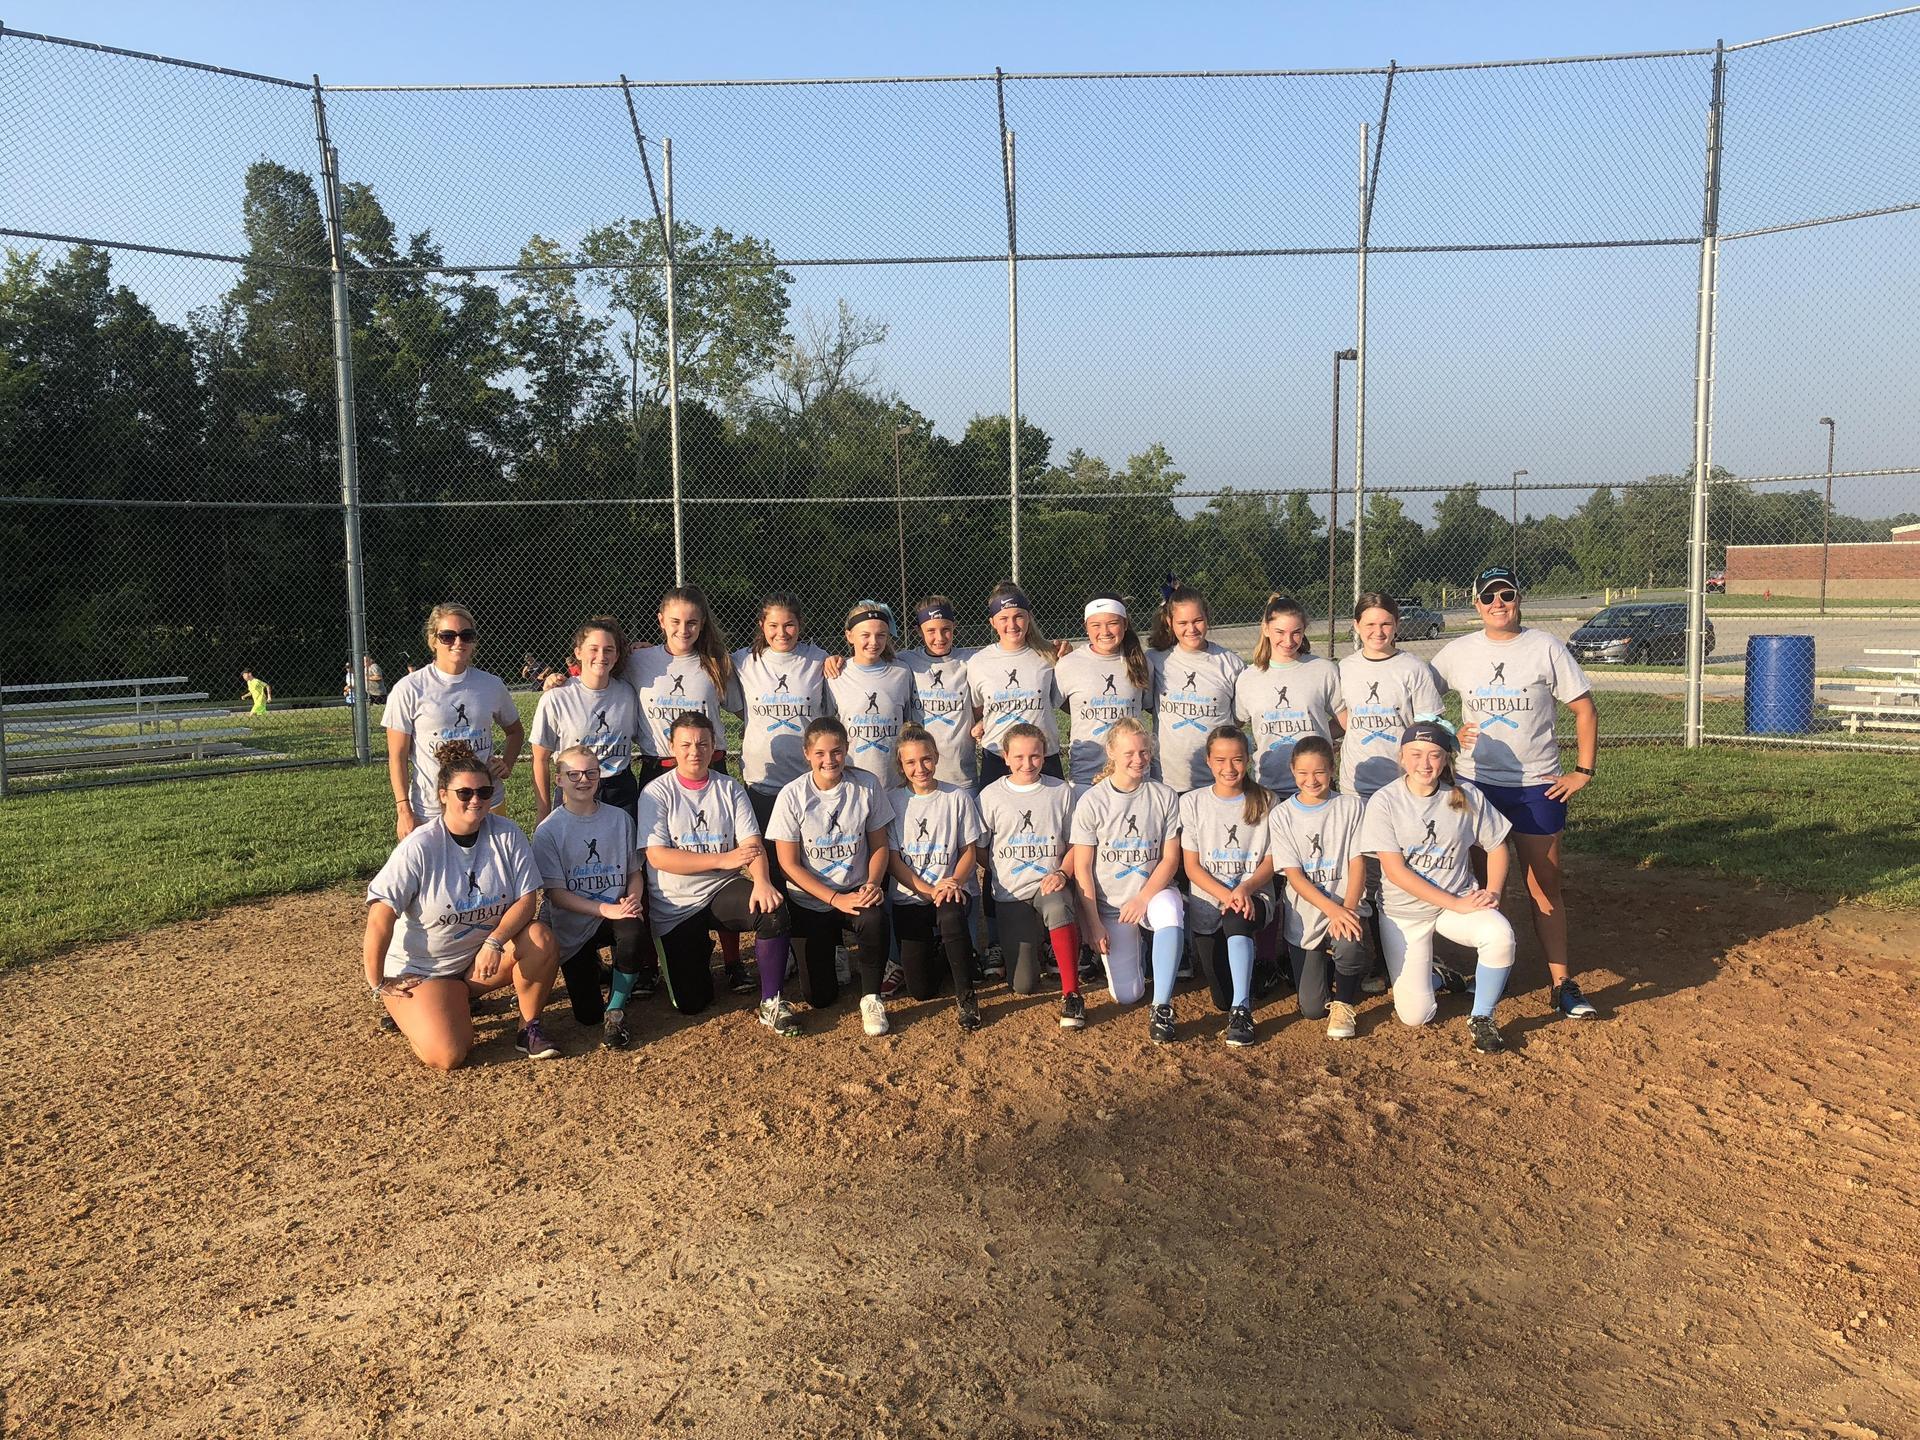 2018 Softball Camp